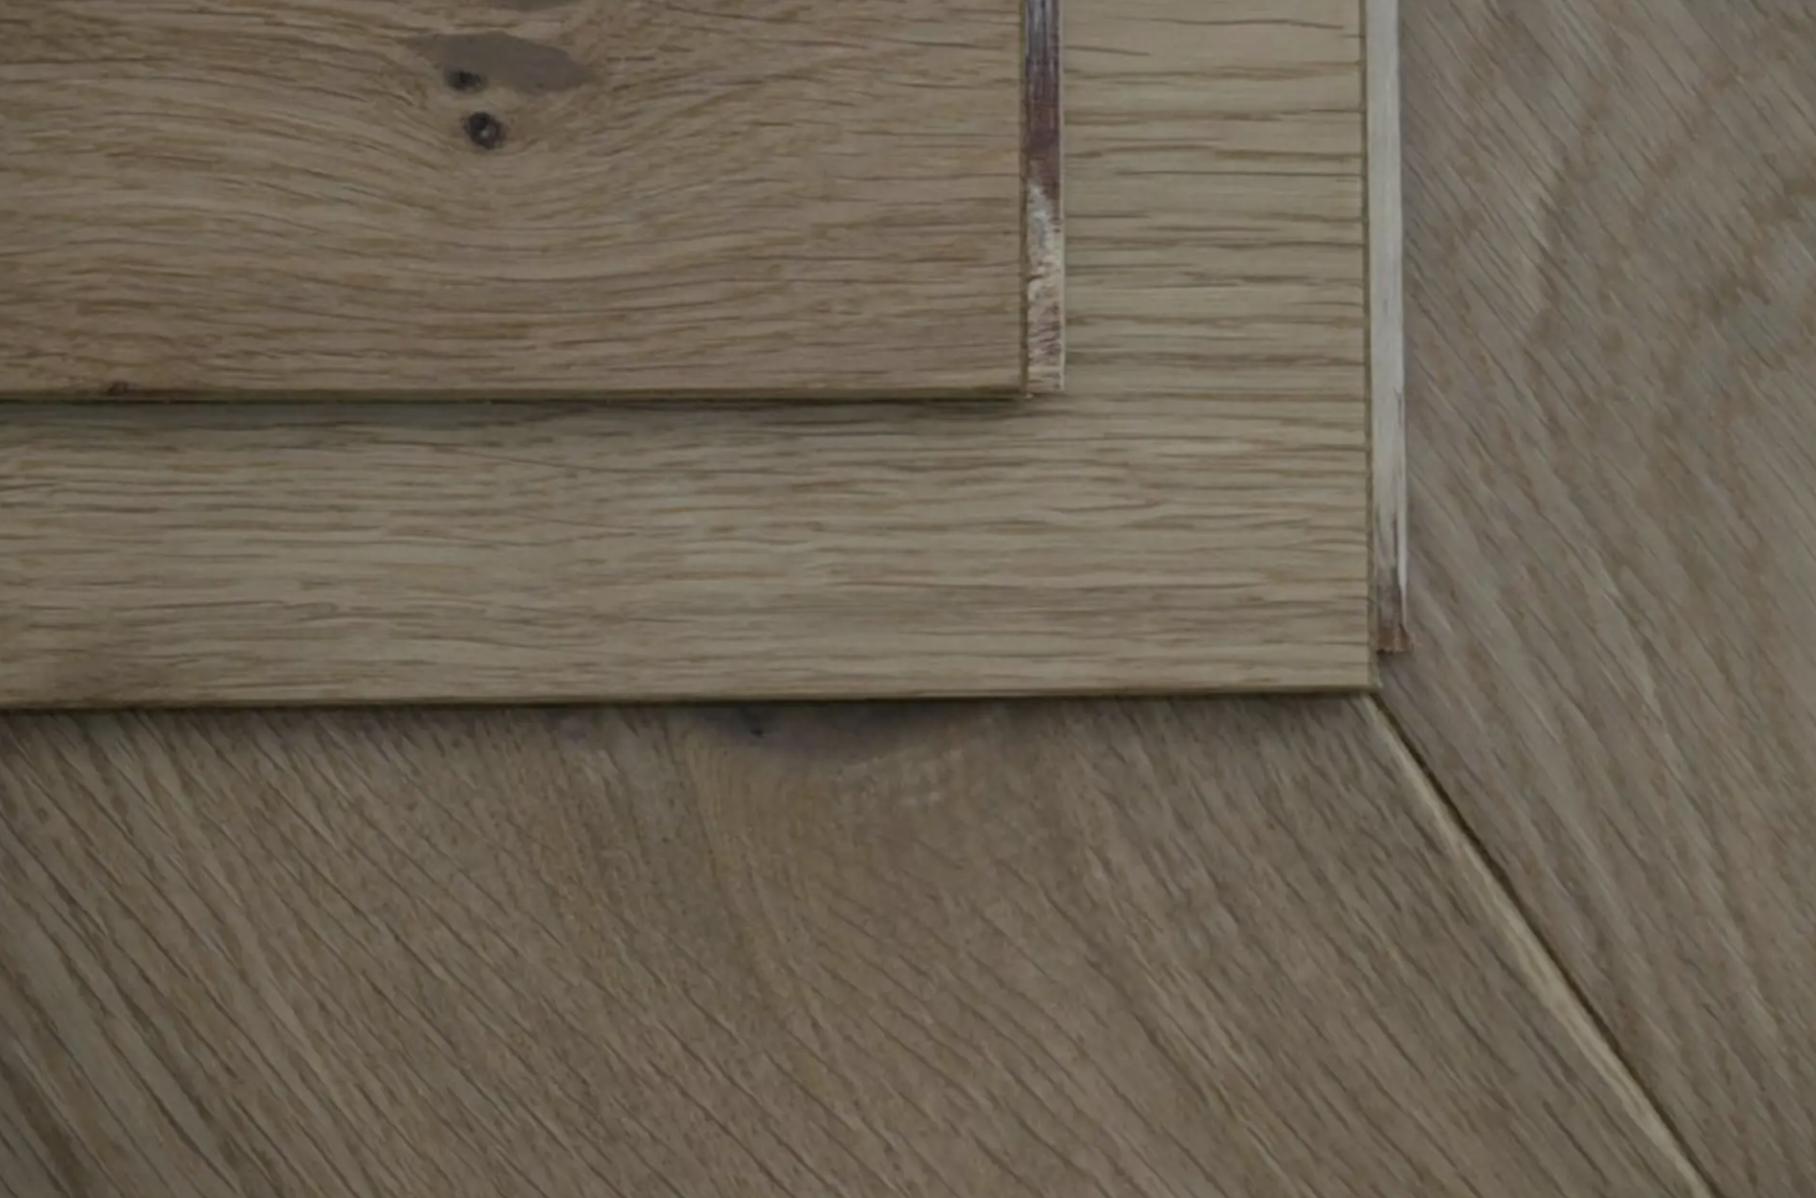 engineered wood floorboard